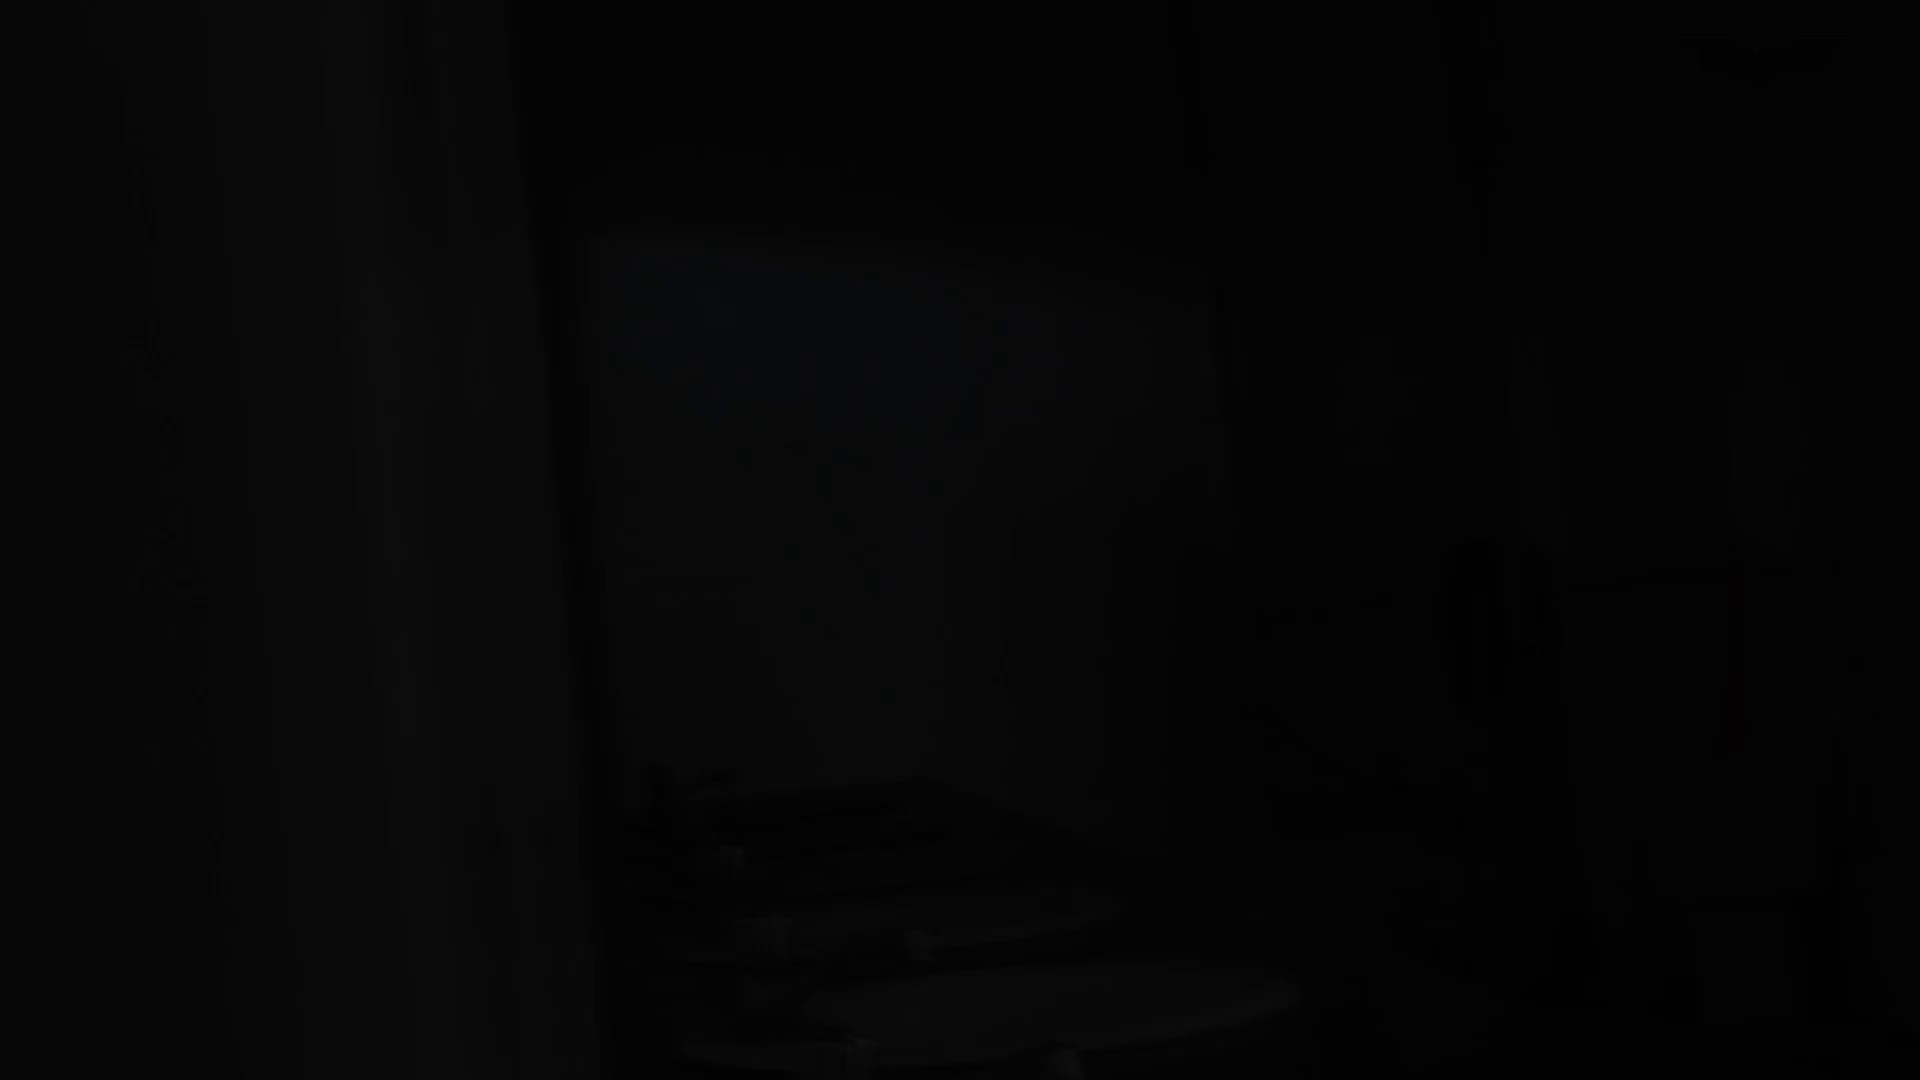 JD盗撮 美女の洗面所の秘密 Vol.55 盛合せ 戯れ無修正画像 91画像 44